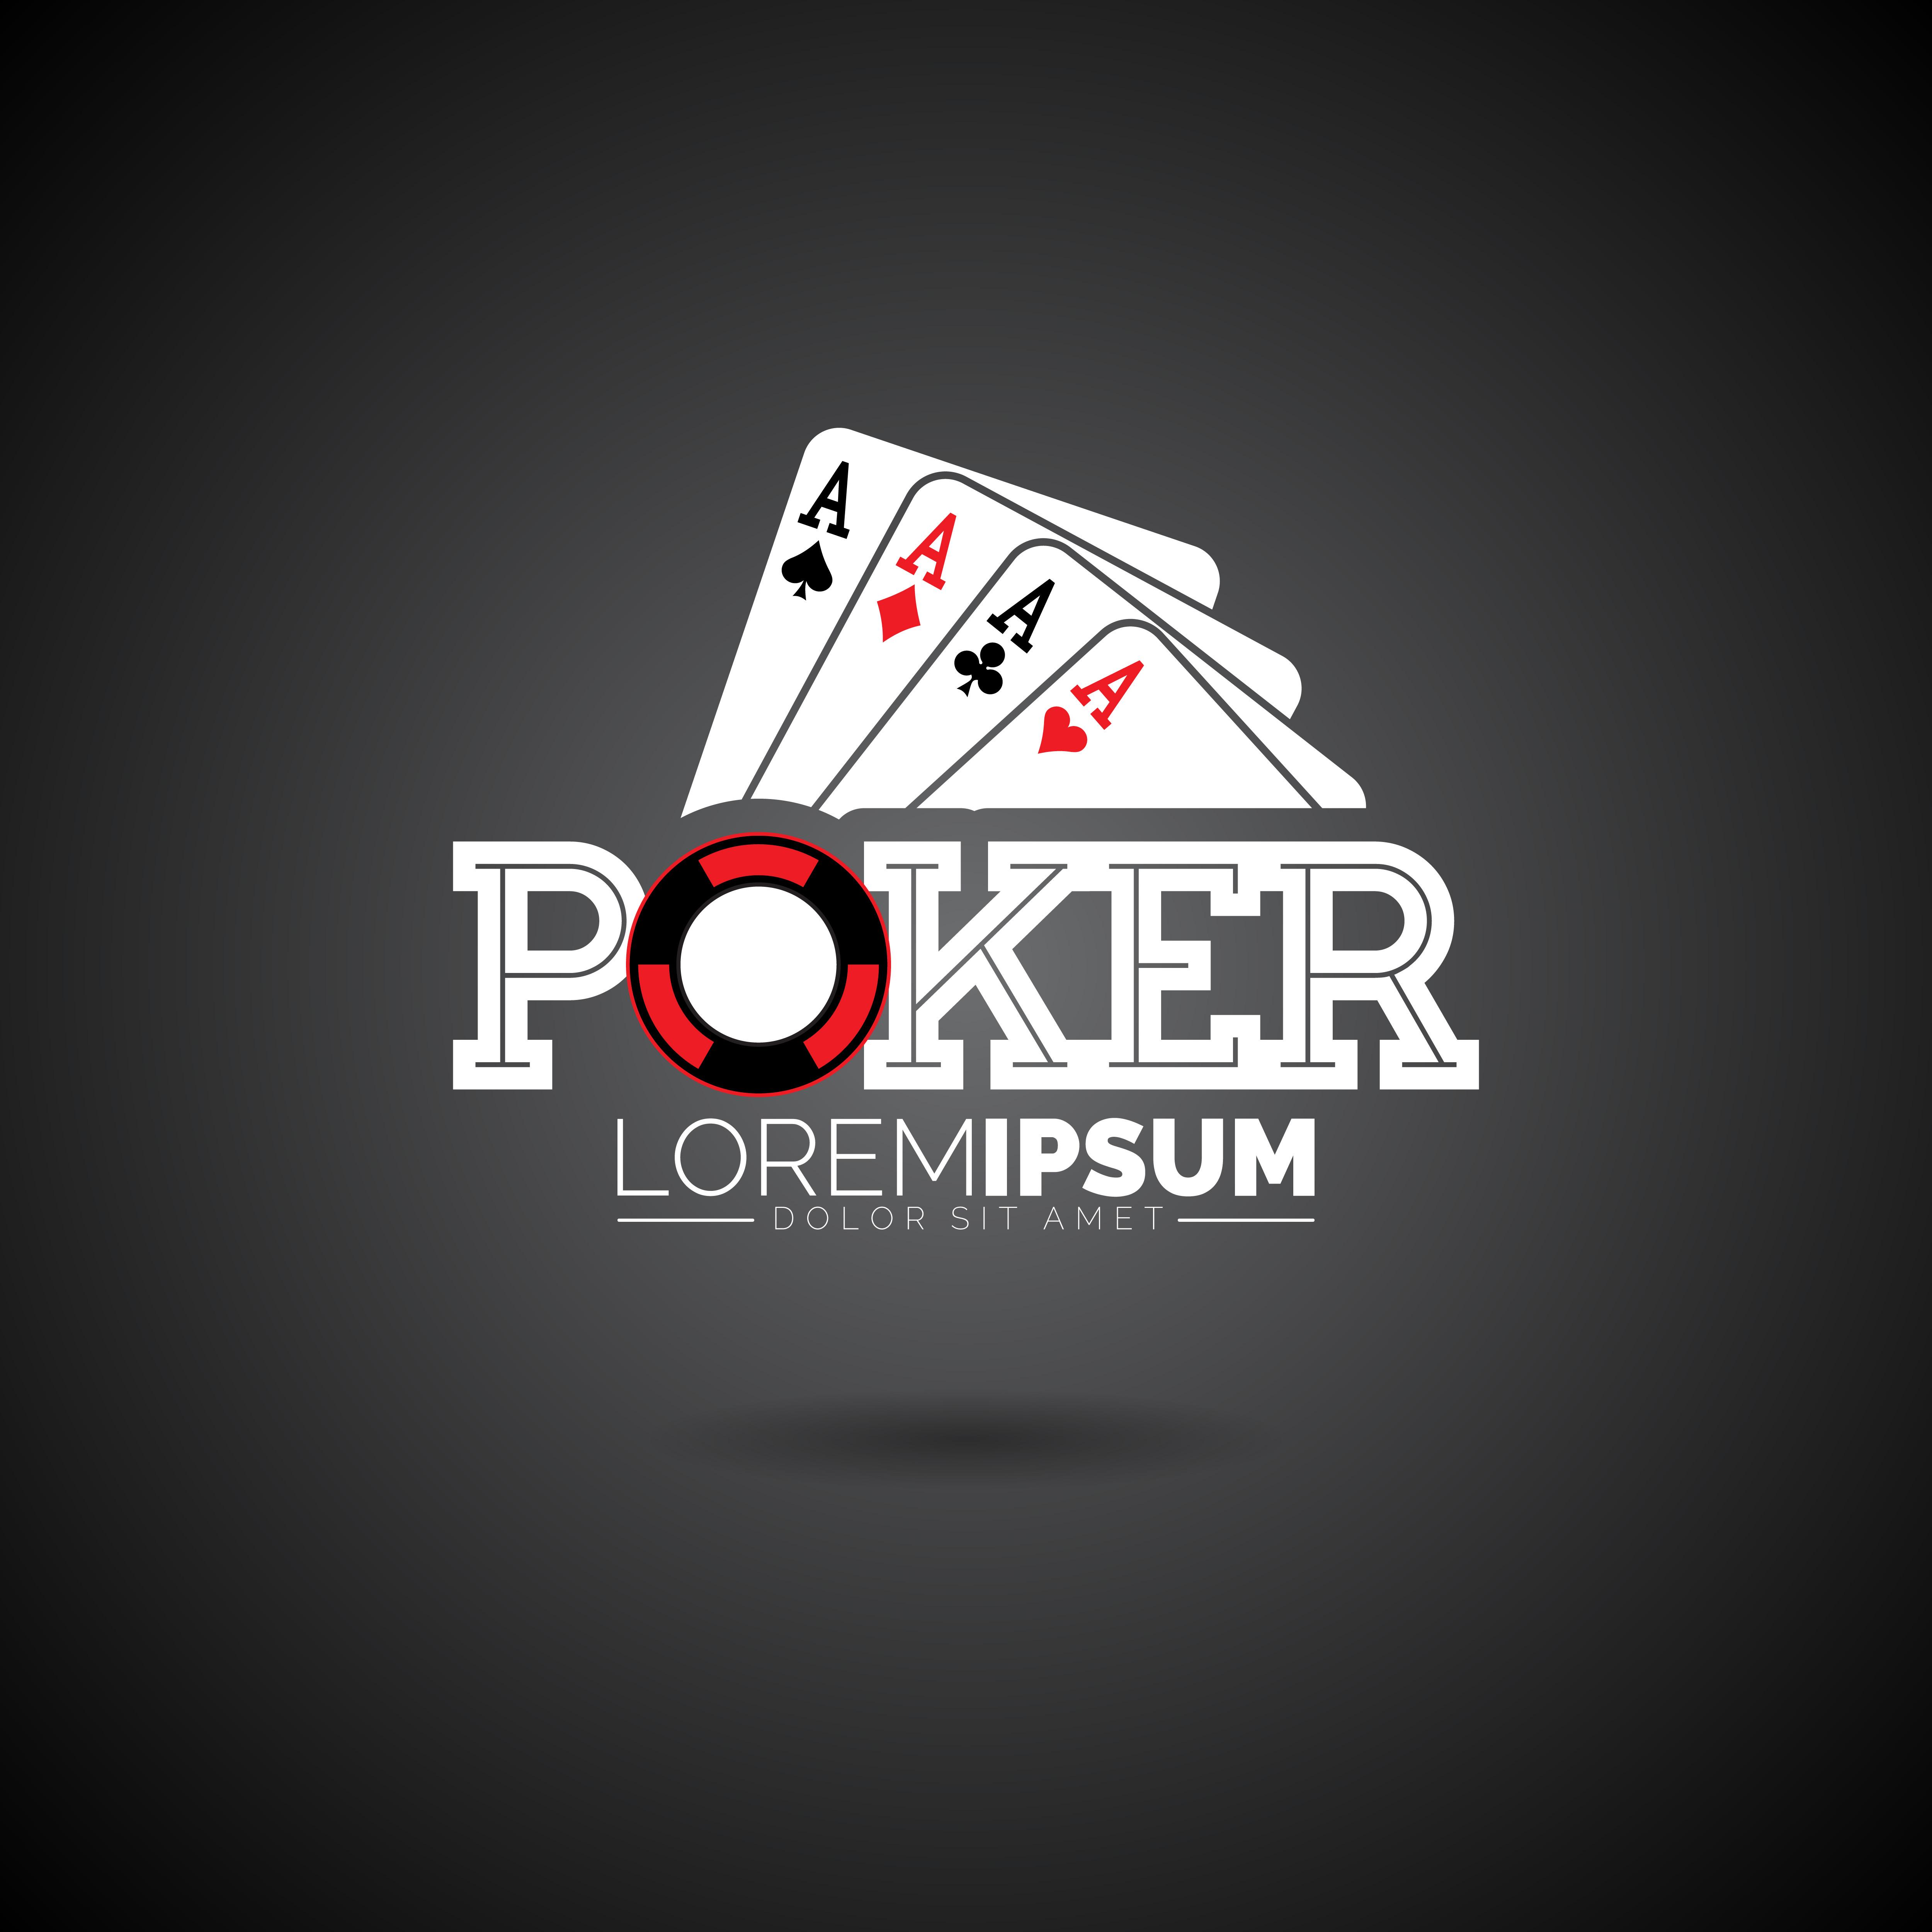 Vintage Logo Design: Vector Poker Logo Design Template With Gambling Elements